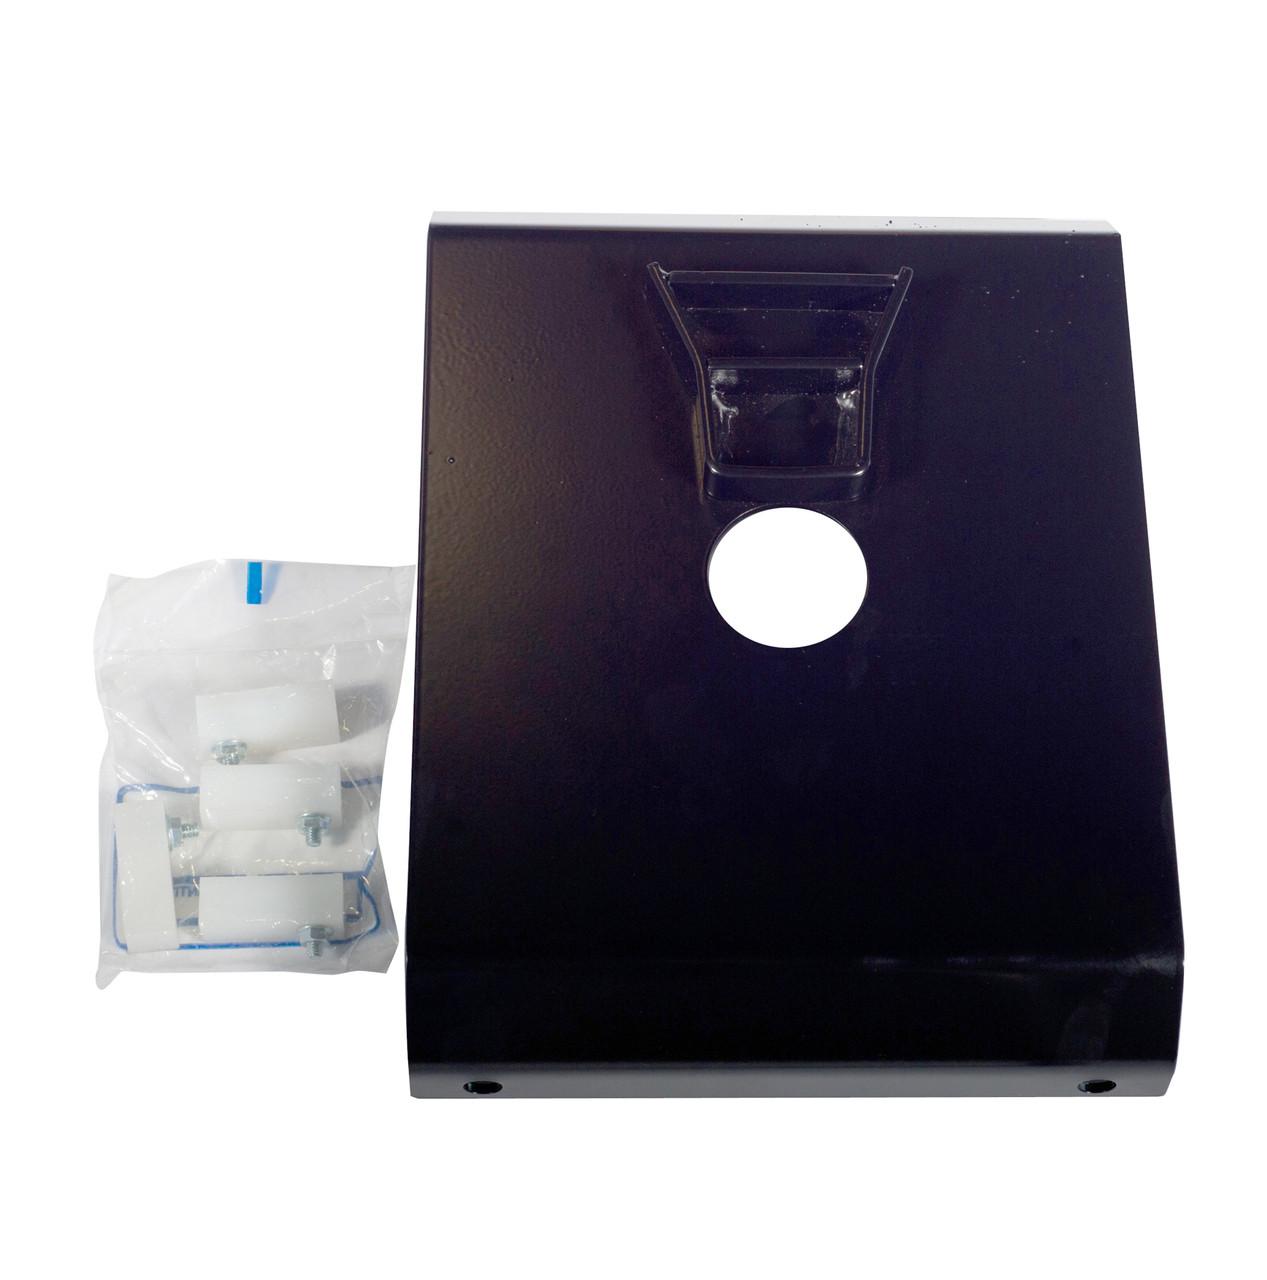 6025 --- Demco Capture Plate for MOR/ryde Pinbox